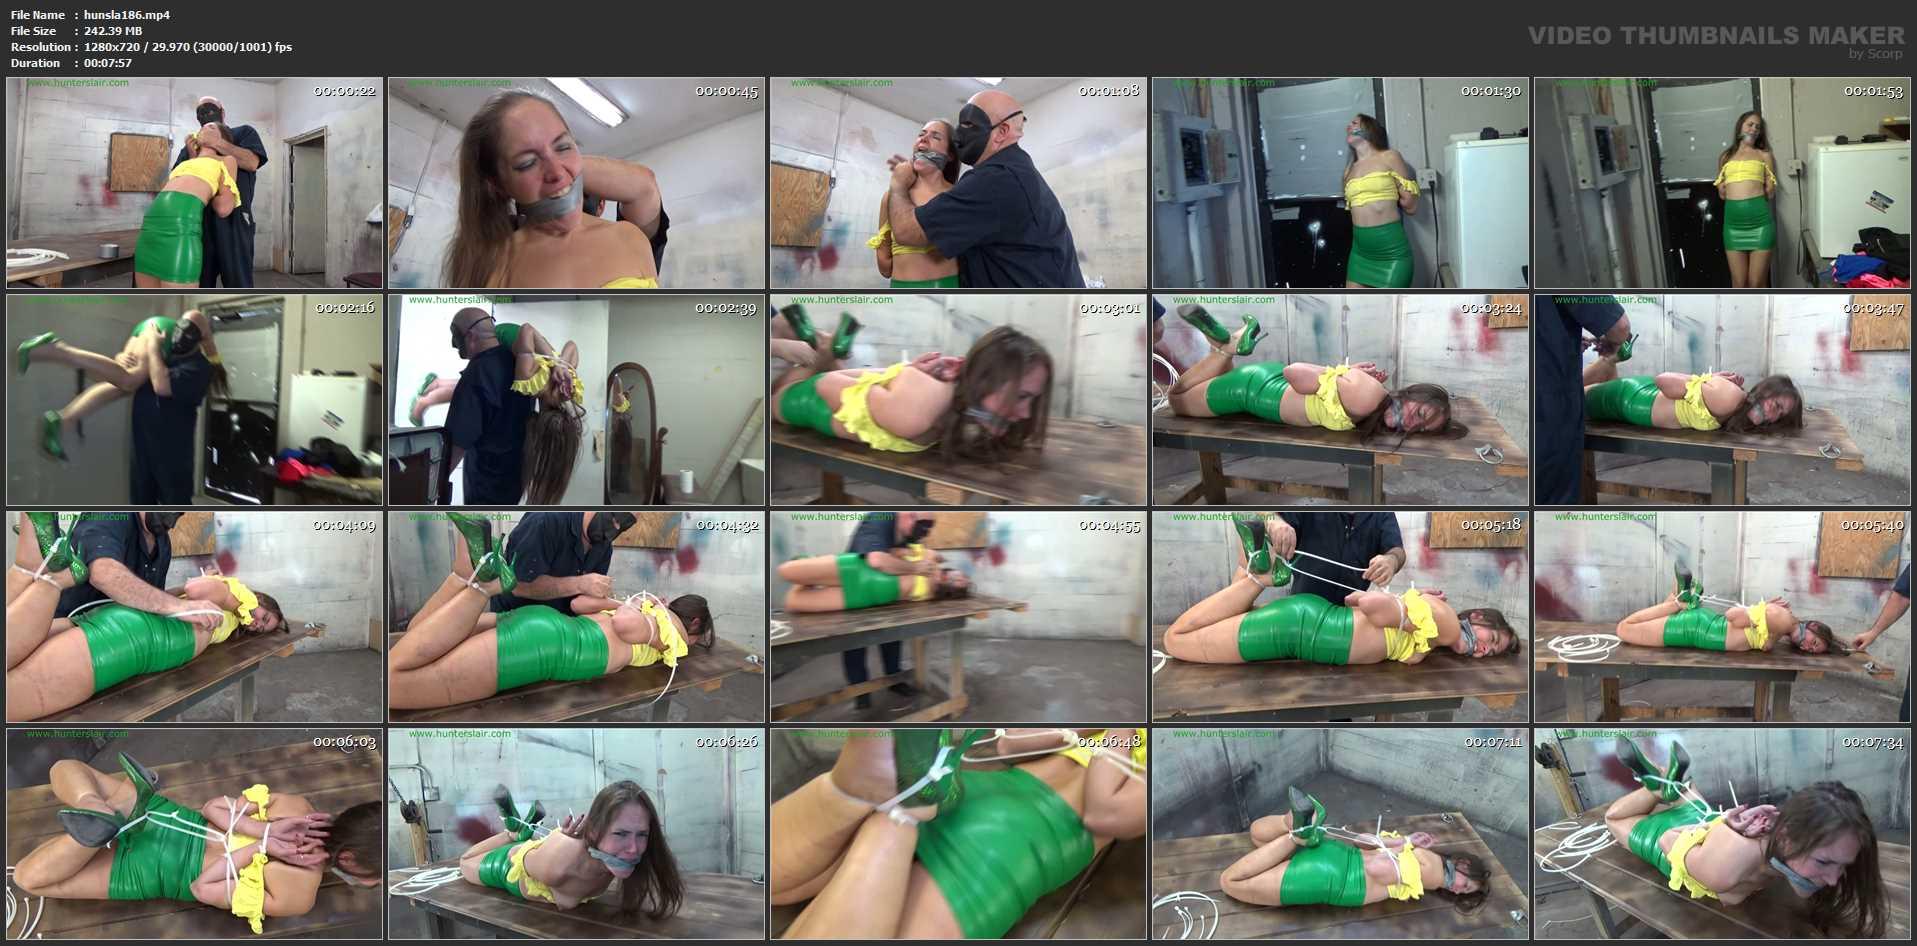 [HUNTERSLAIR] Bound in brutal zipties she tried to escape. Featuring: Rachel Adams [HD][720p][MP4]